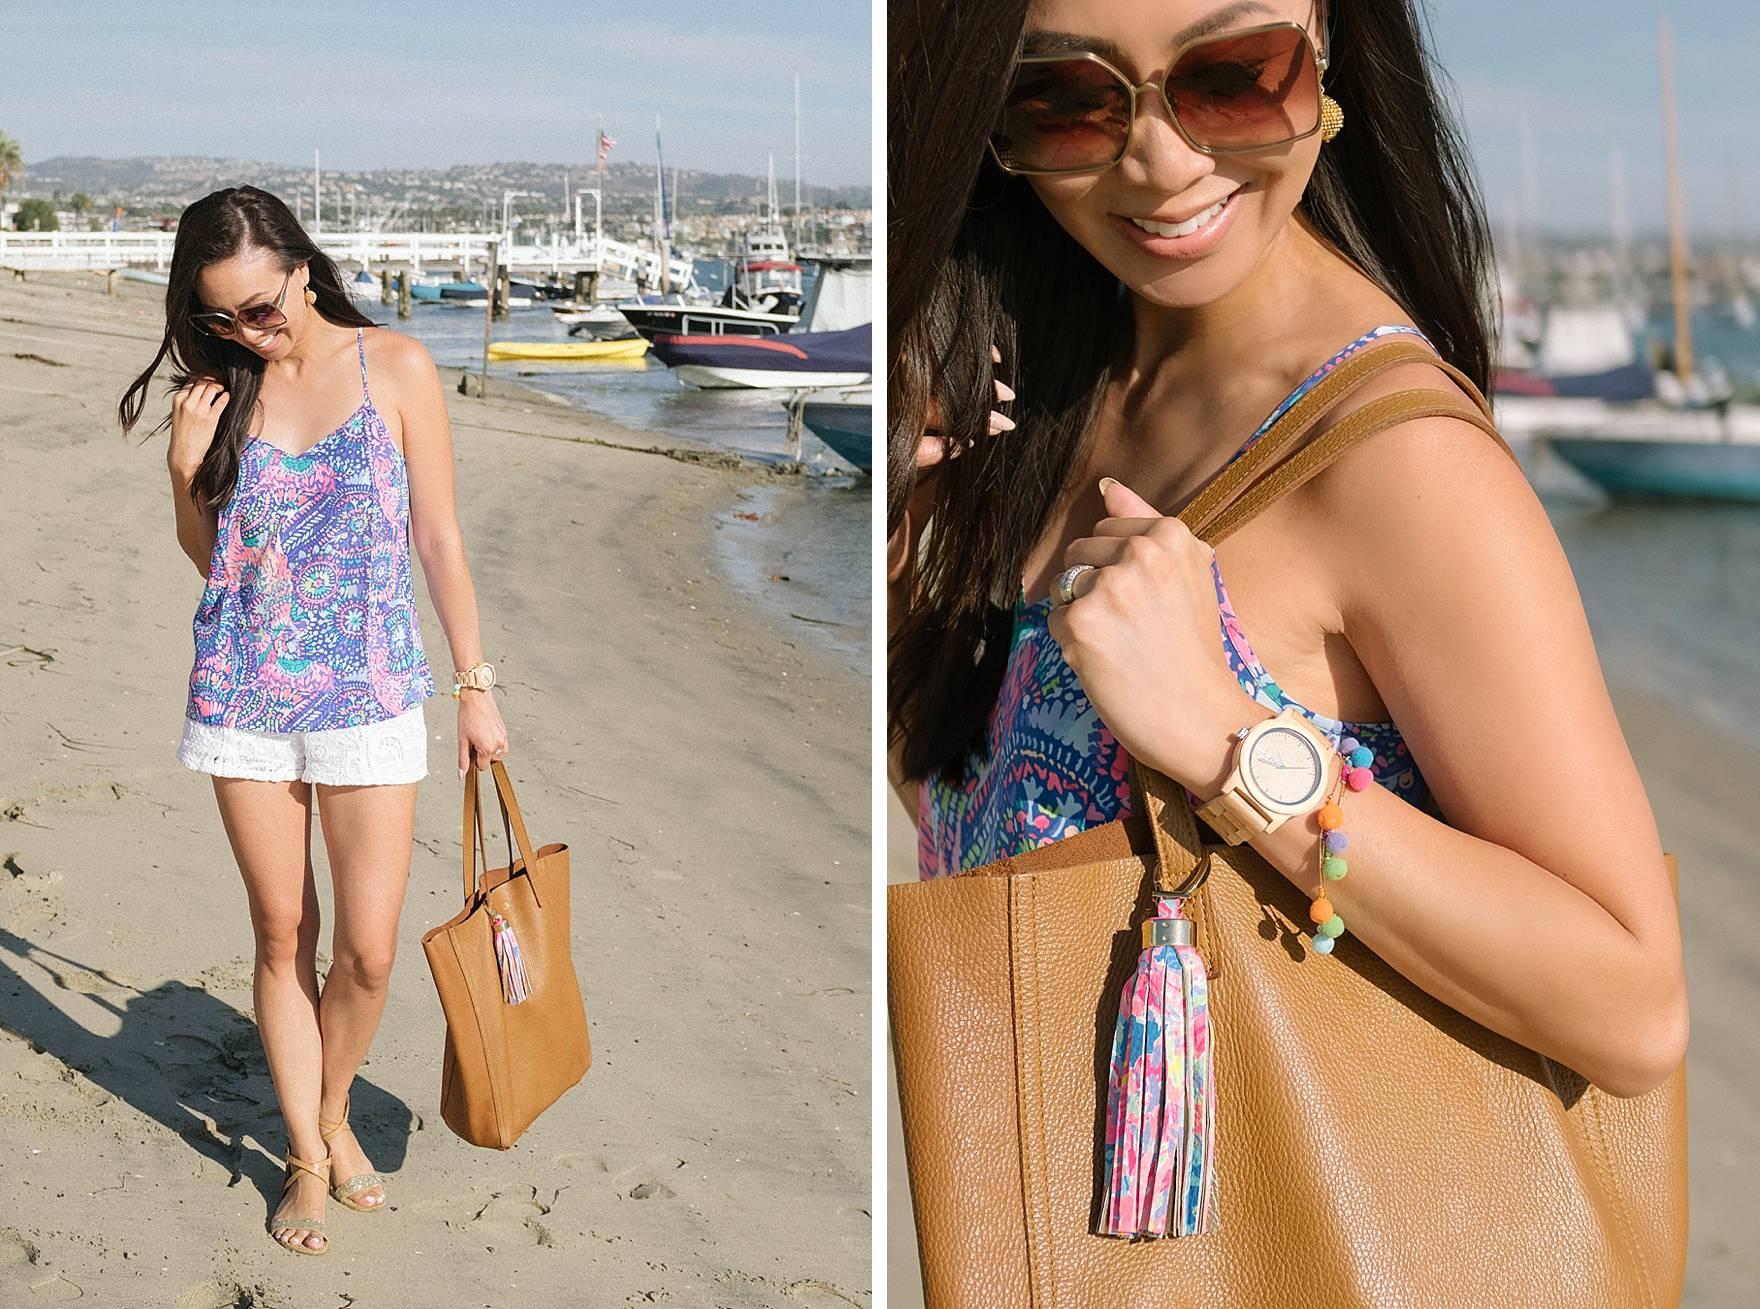 Lilly Pulitzer DUSK RACER BACK SILK TANK TOP, walking along Balboa Island